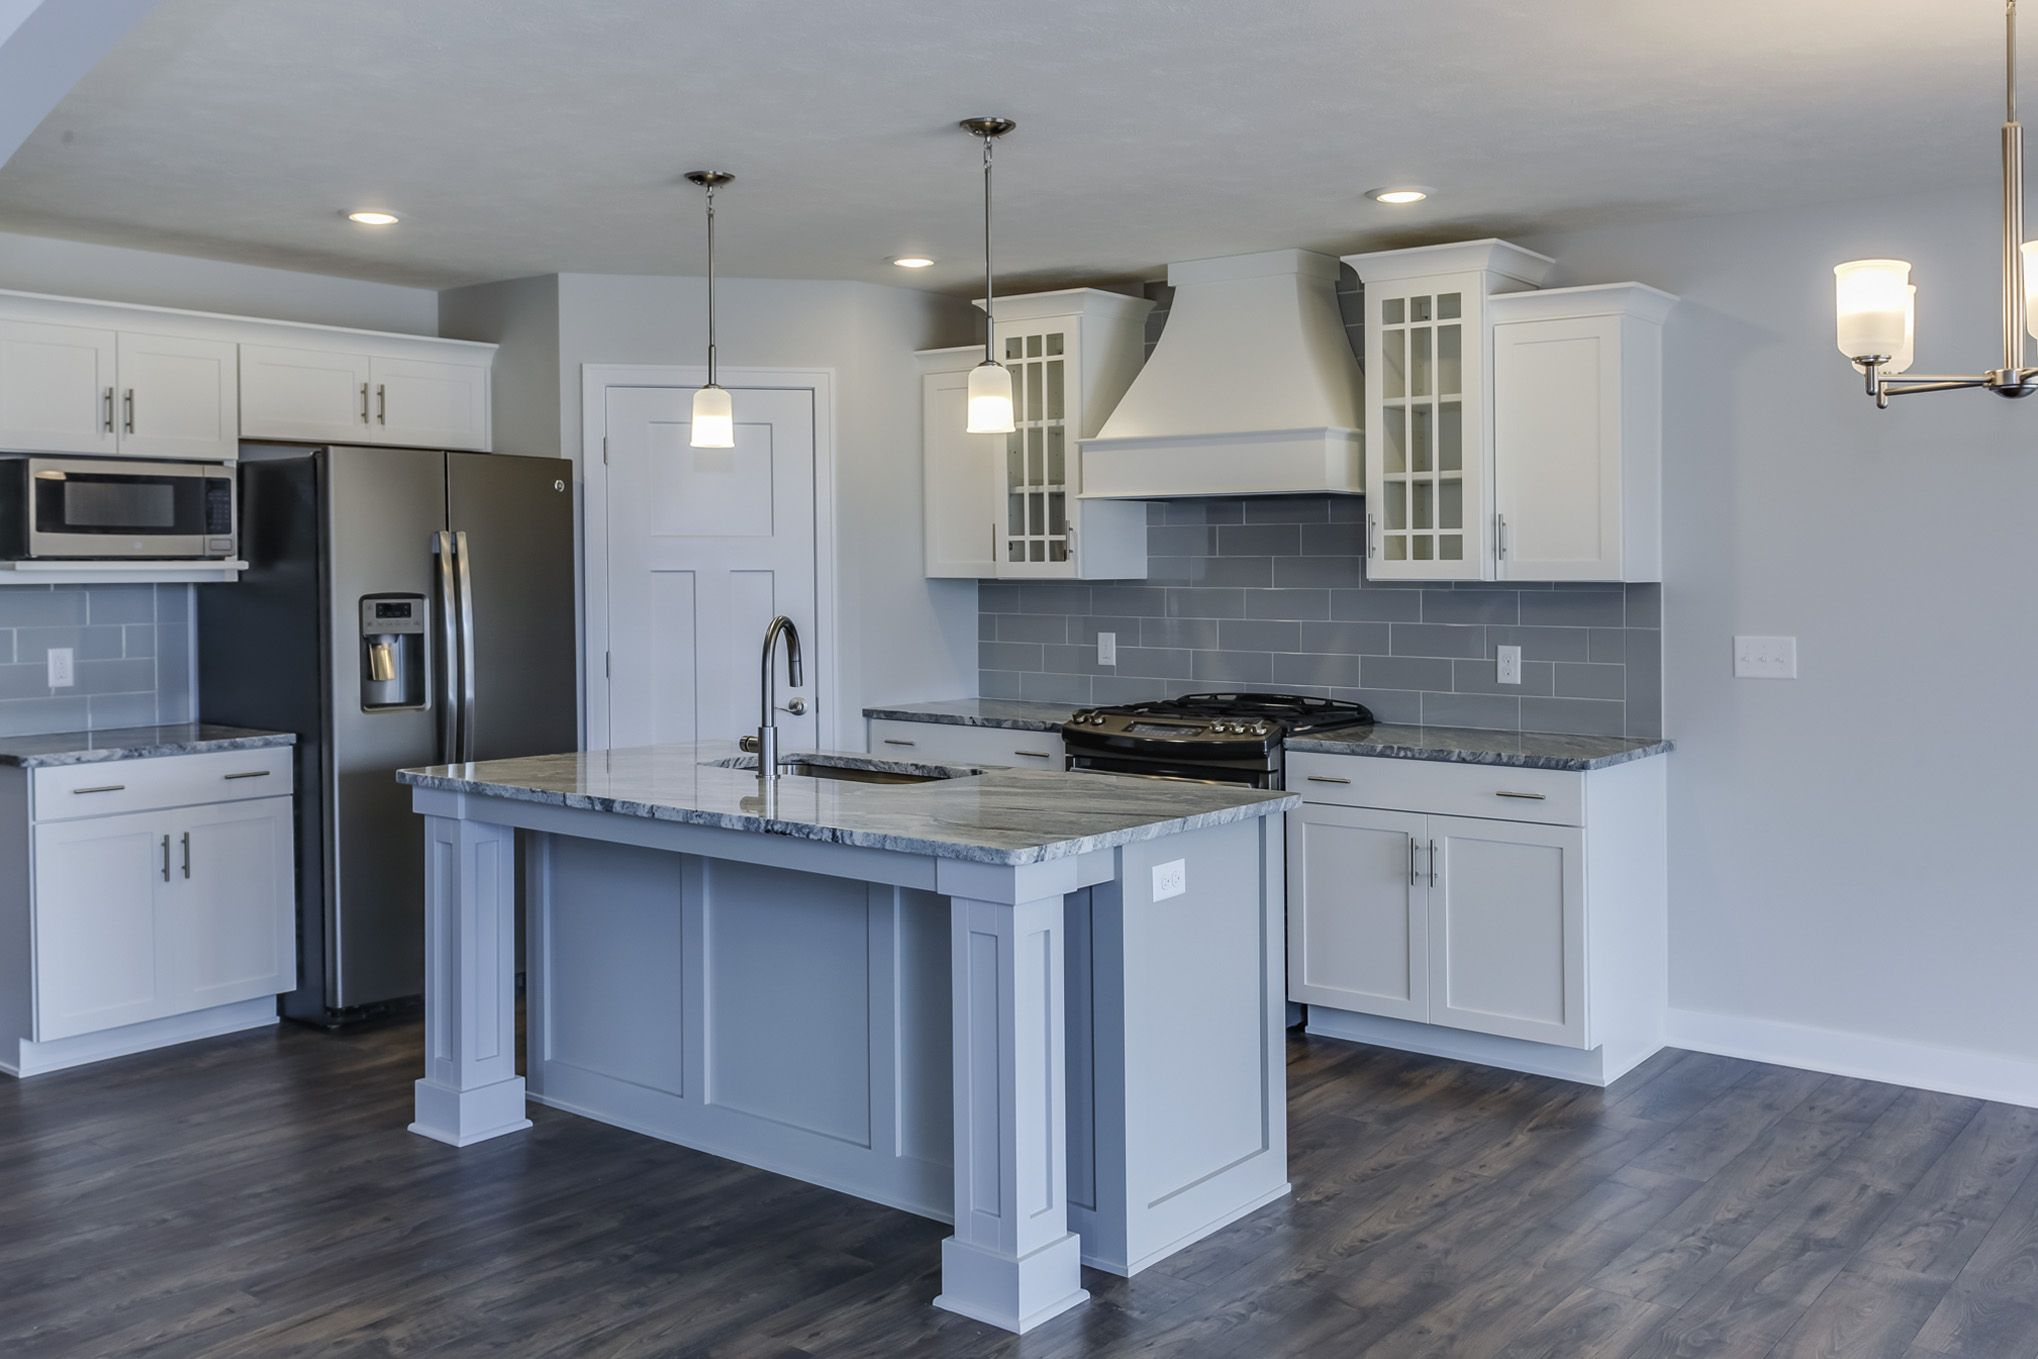 Mayfair Kitchen  Eastbrook Homes, MI #NewHome #RealEstate #WhiteCabinets  #WoodFlooring #BeautifulKitchen #EastbrookHomes